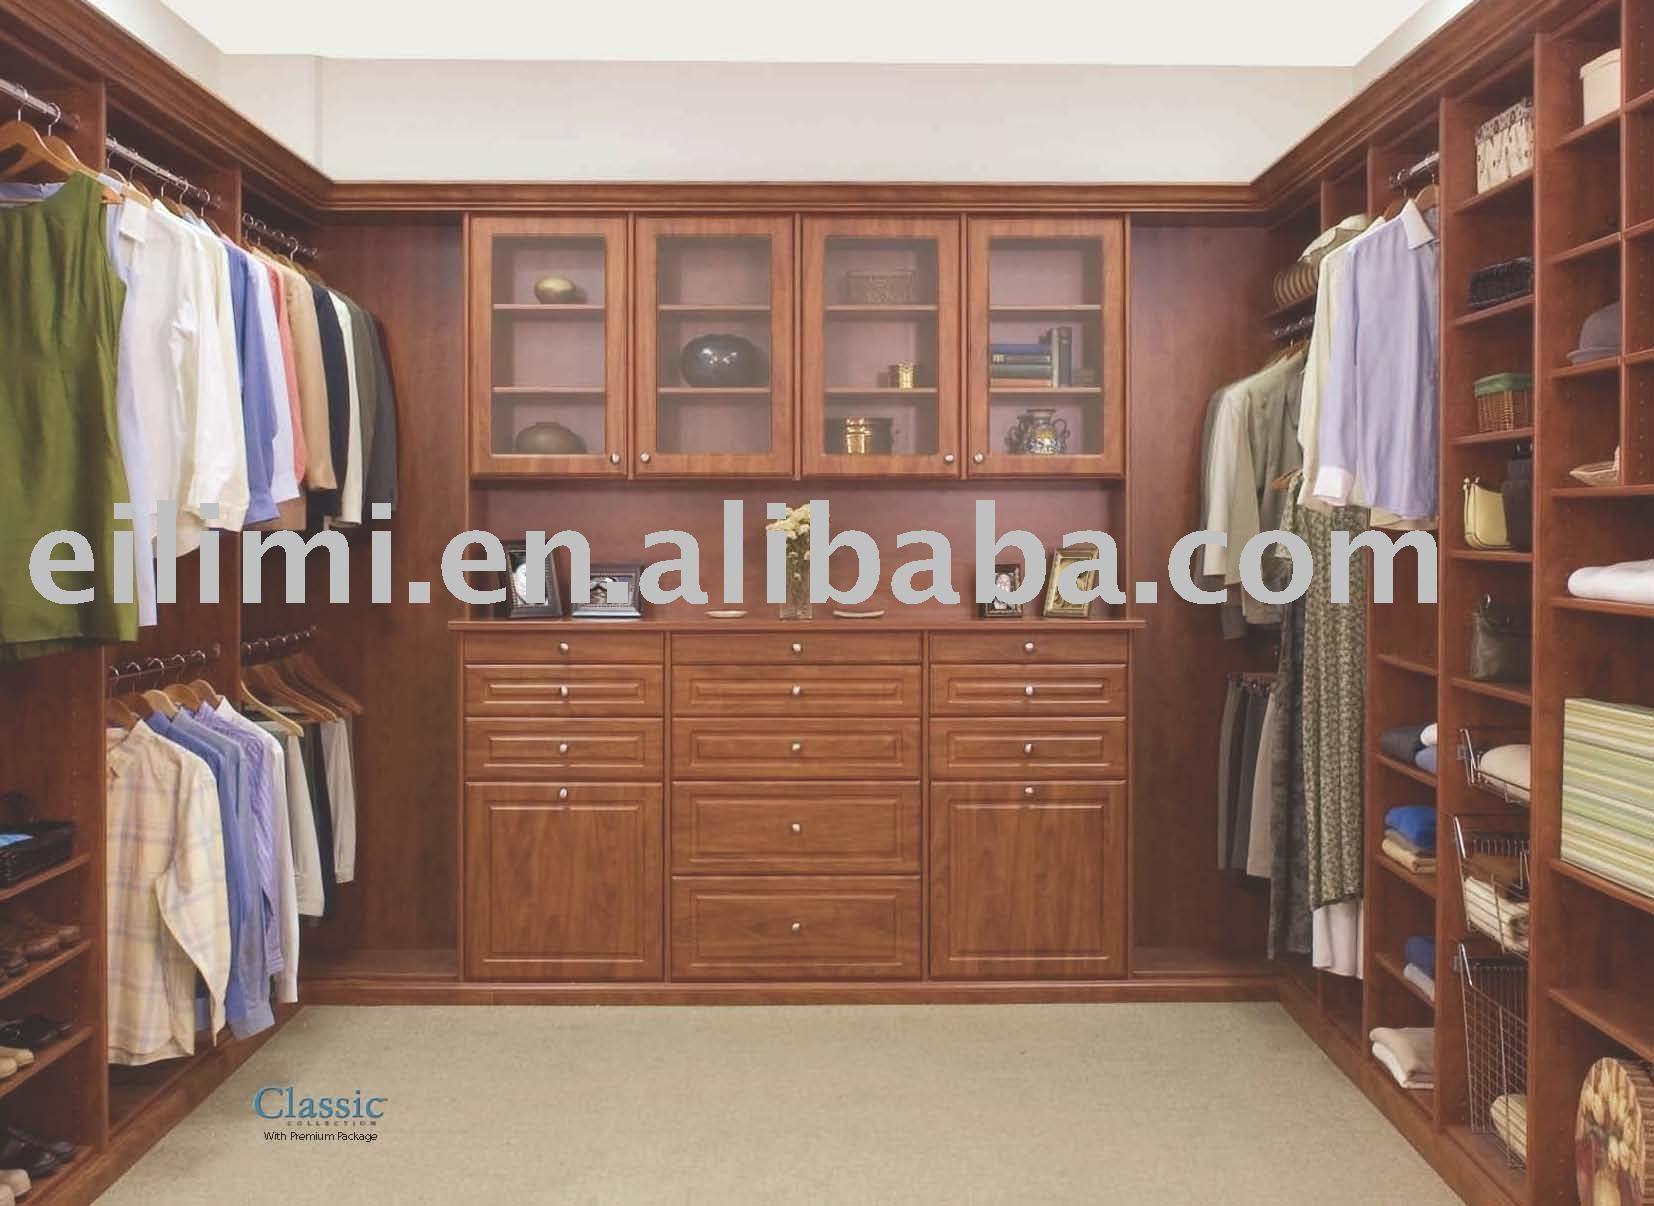 Wall Cabinets Kitchen